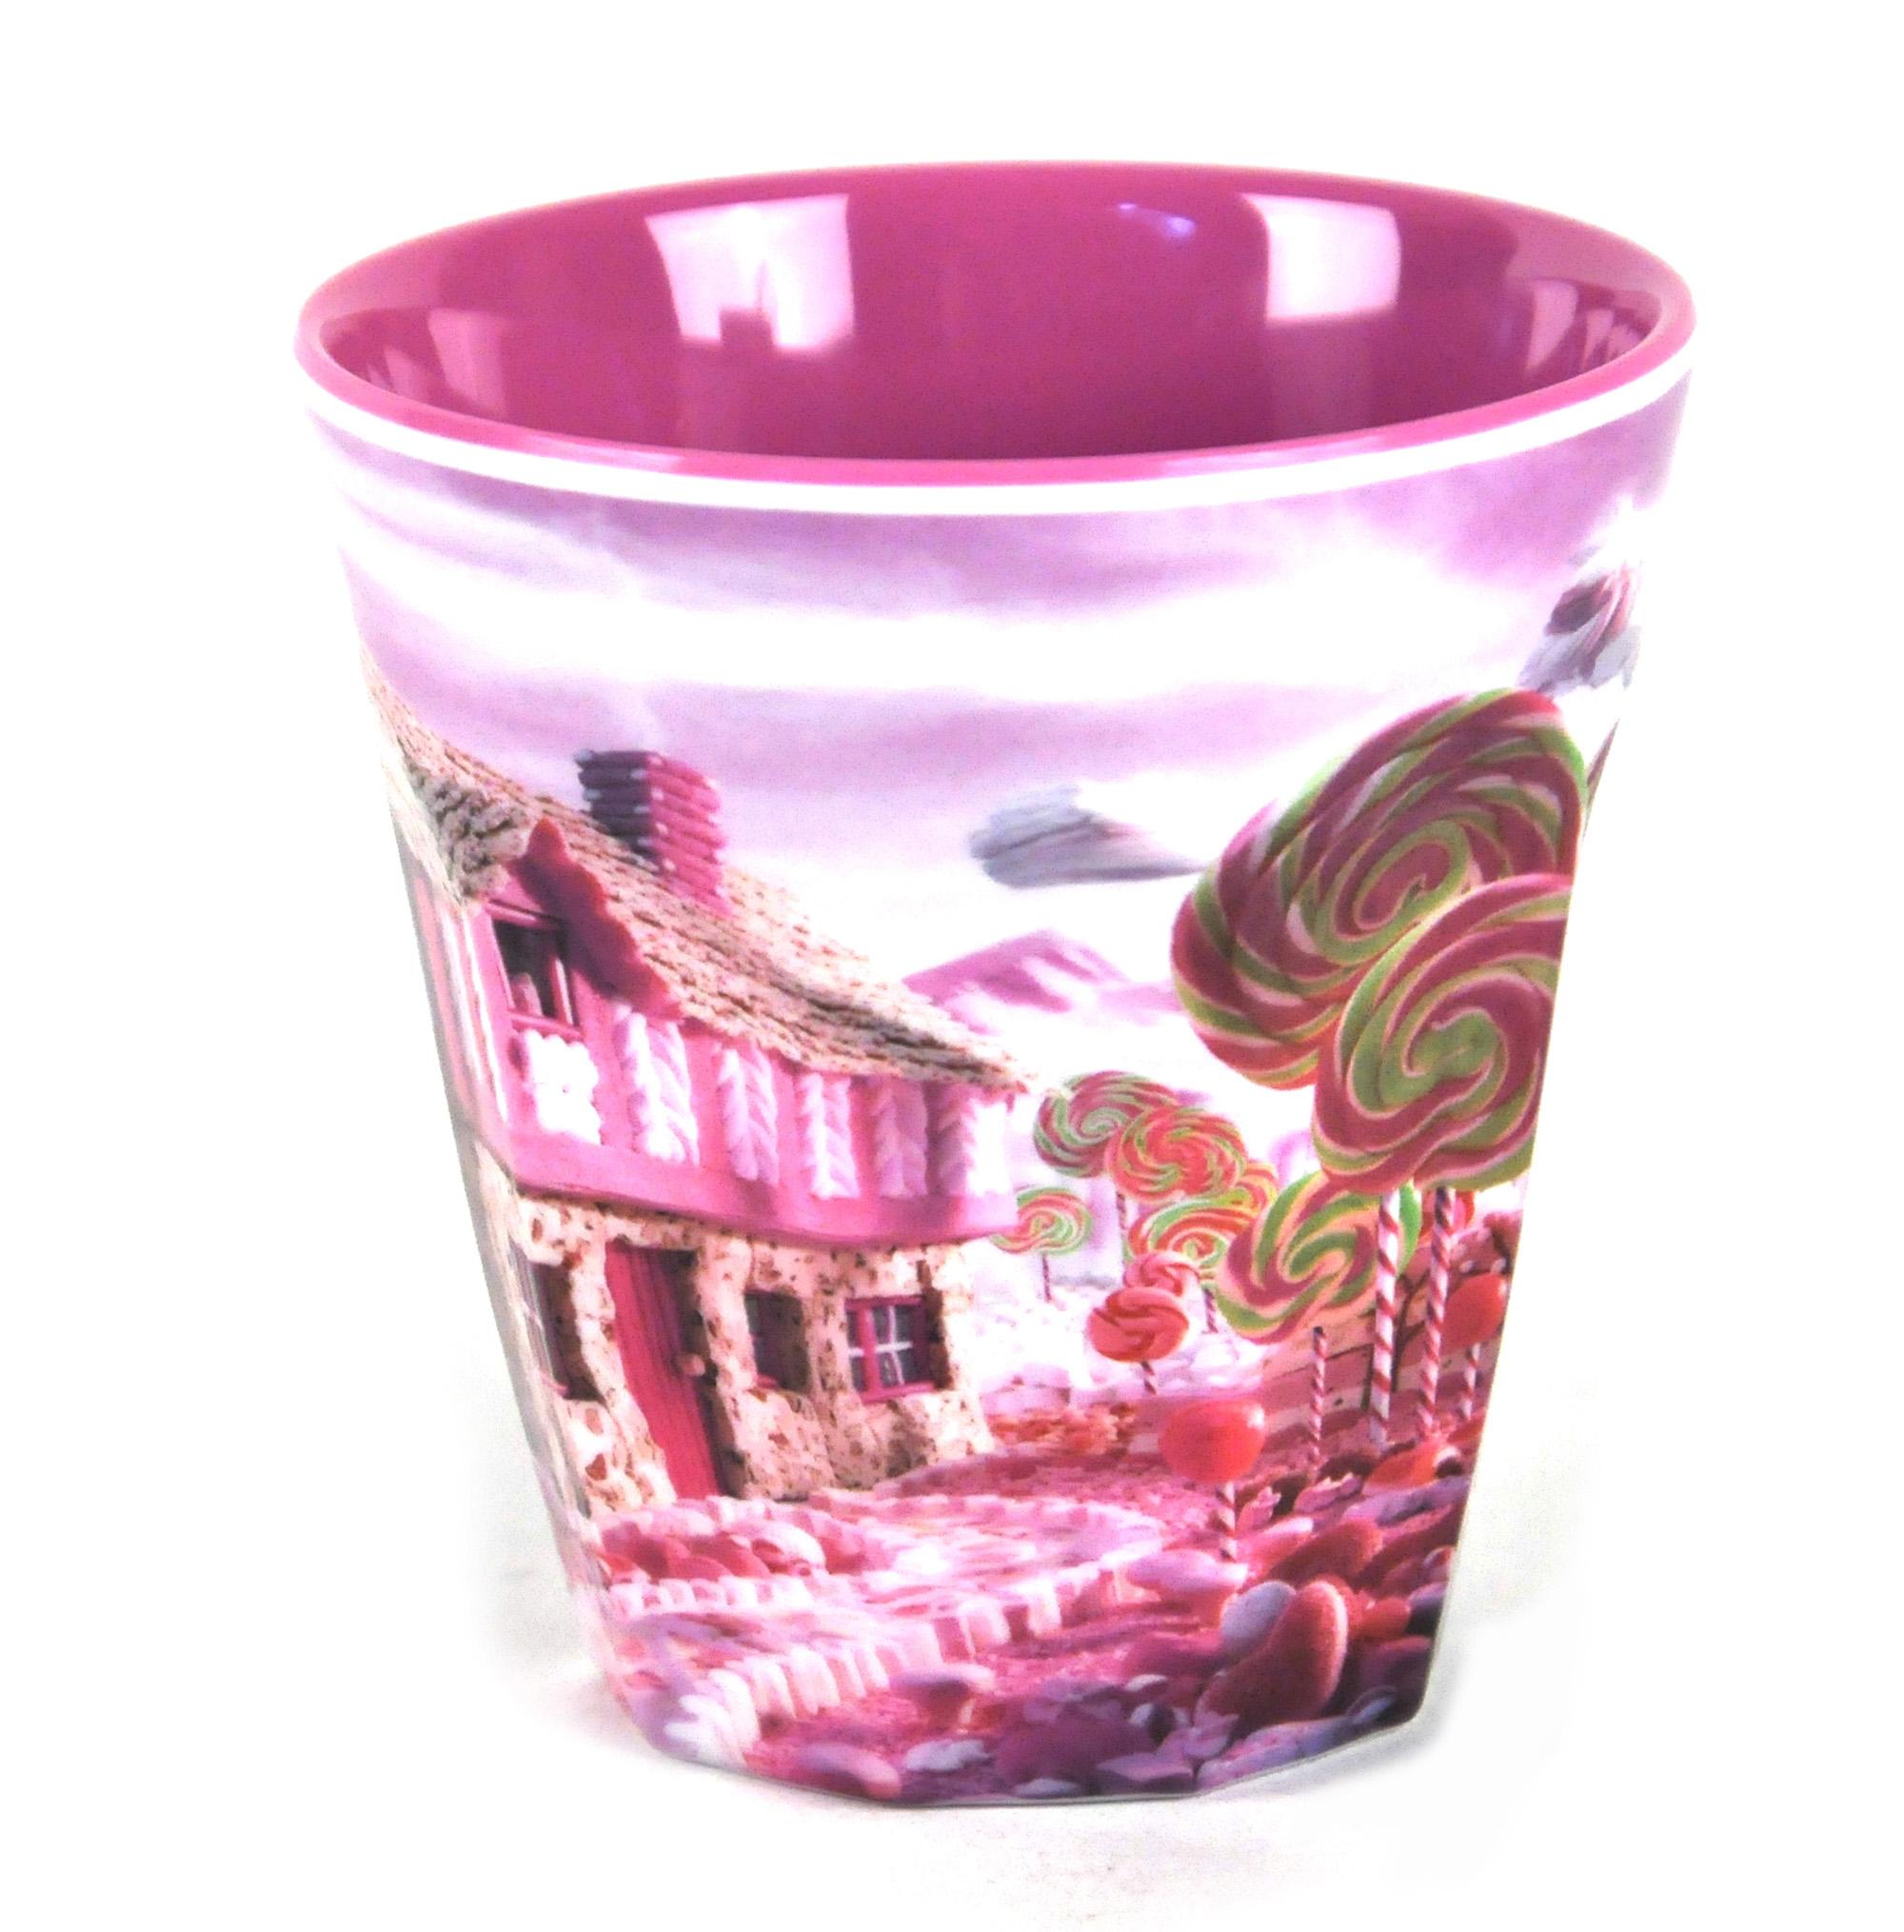 Carl warner tasse de caf avec motif maison de biscuit et bonbon ebay - Maison en biscuit et bonbons ...